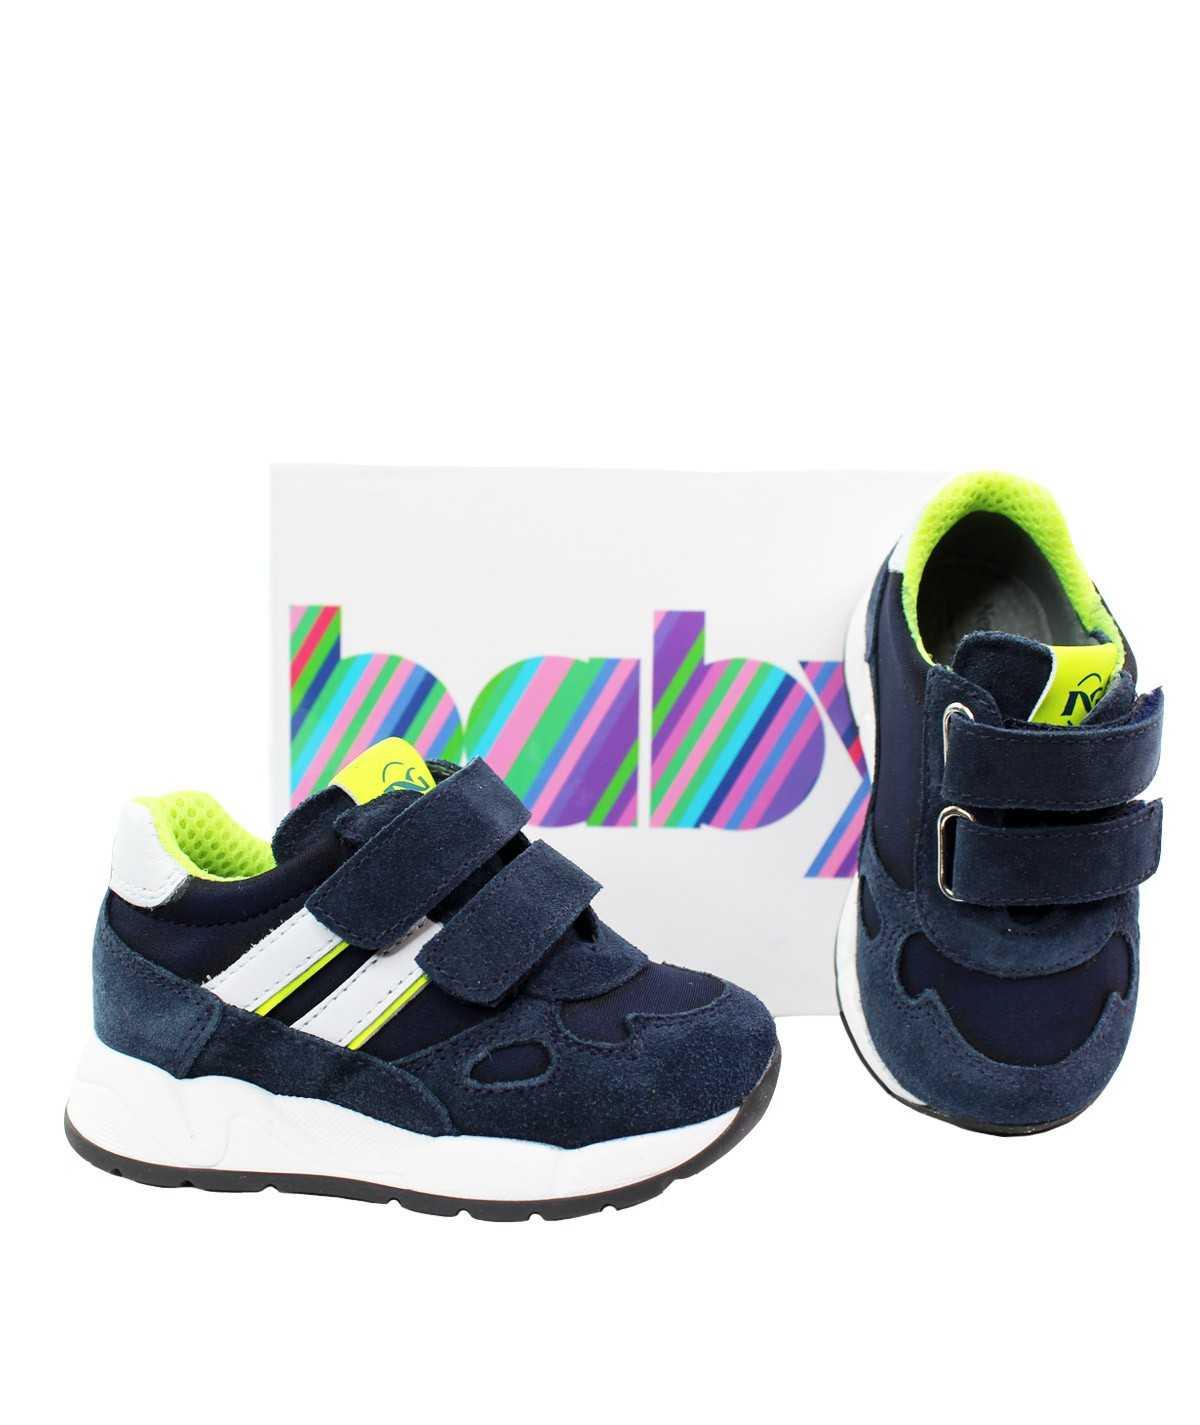 NEROGIARDINI Sneakers Baby